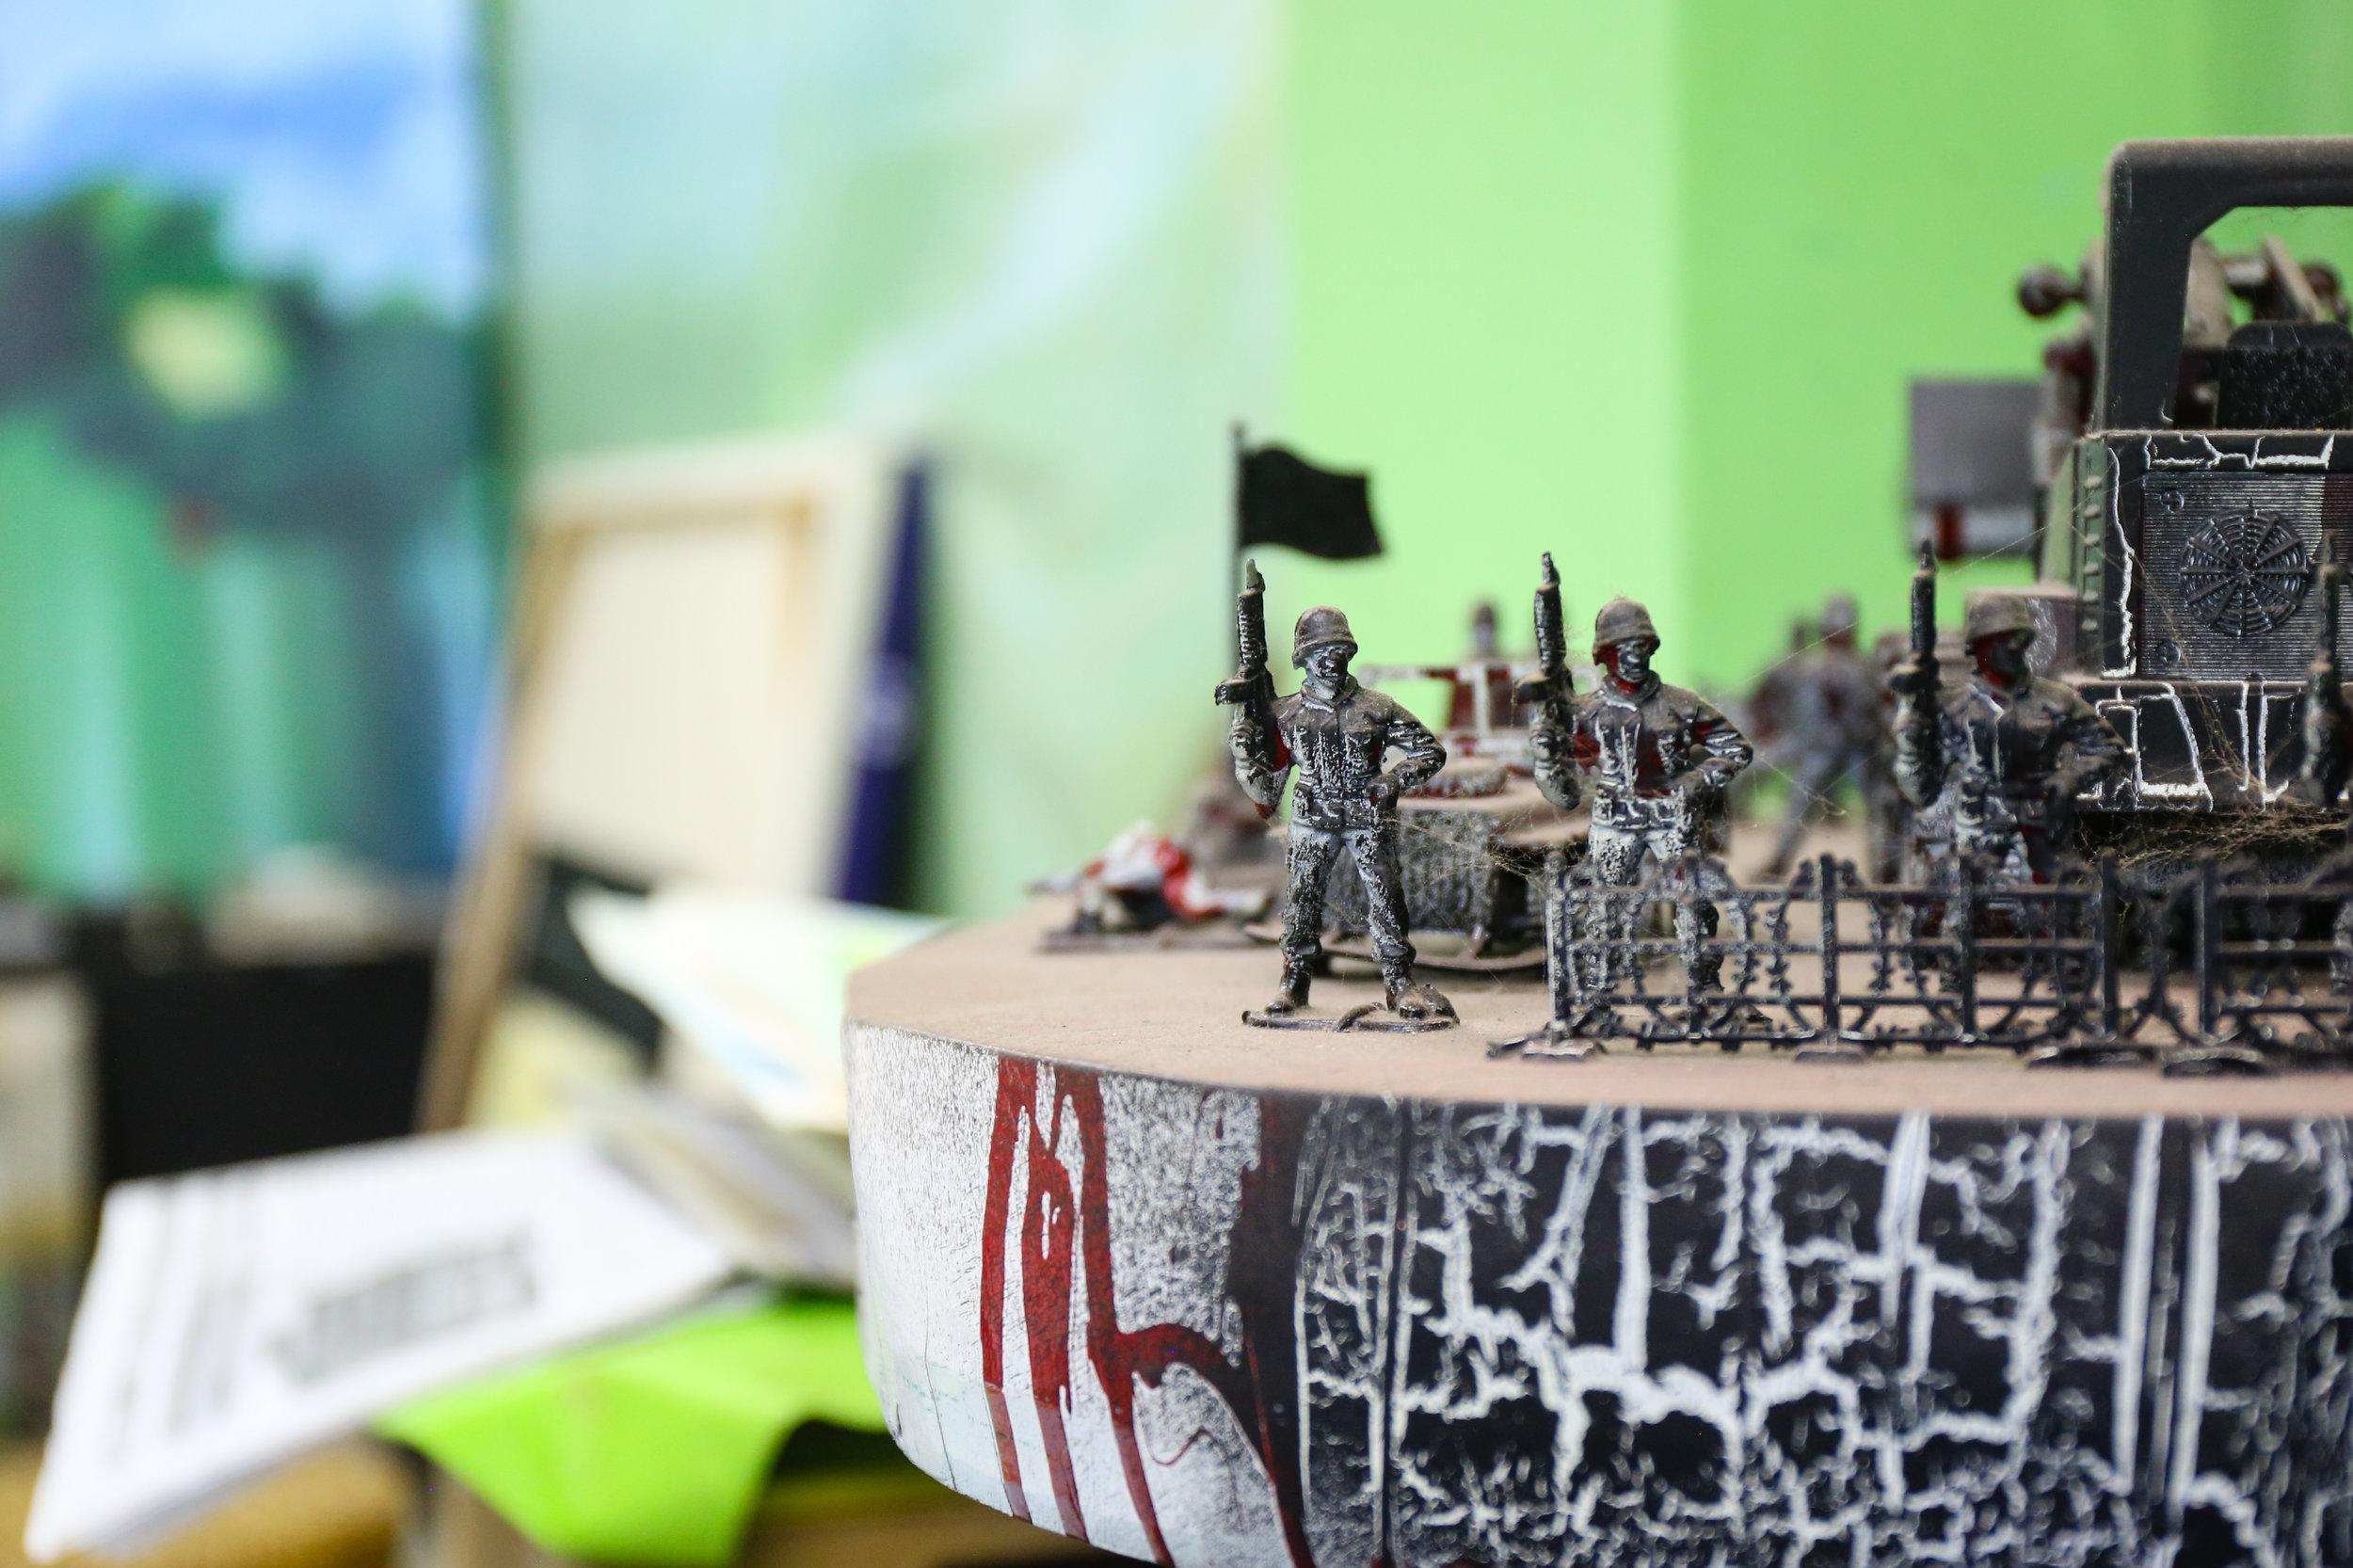 Work seen in the studio of Myanmar artist Nyein Chan Su. Yangon, Myanmar.